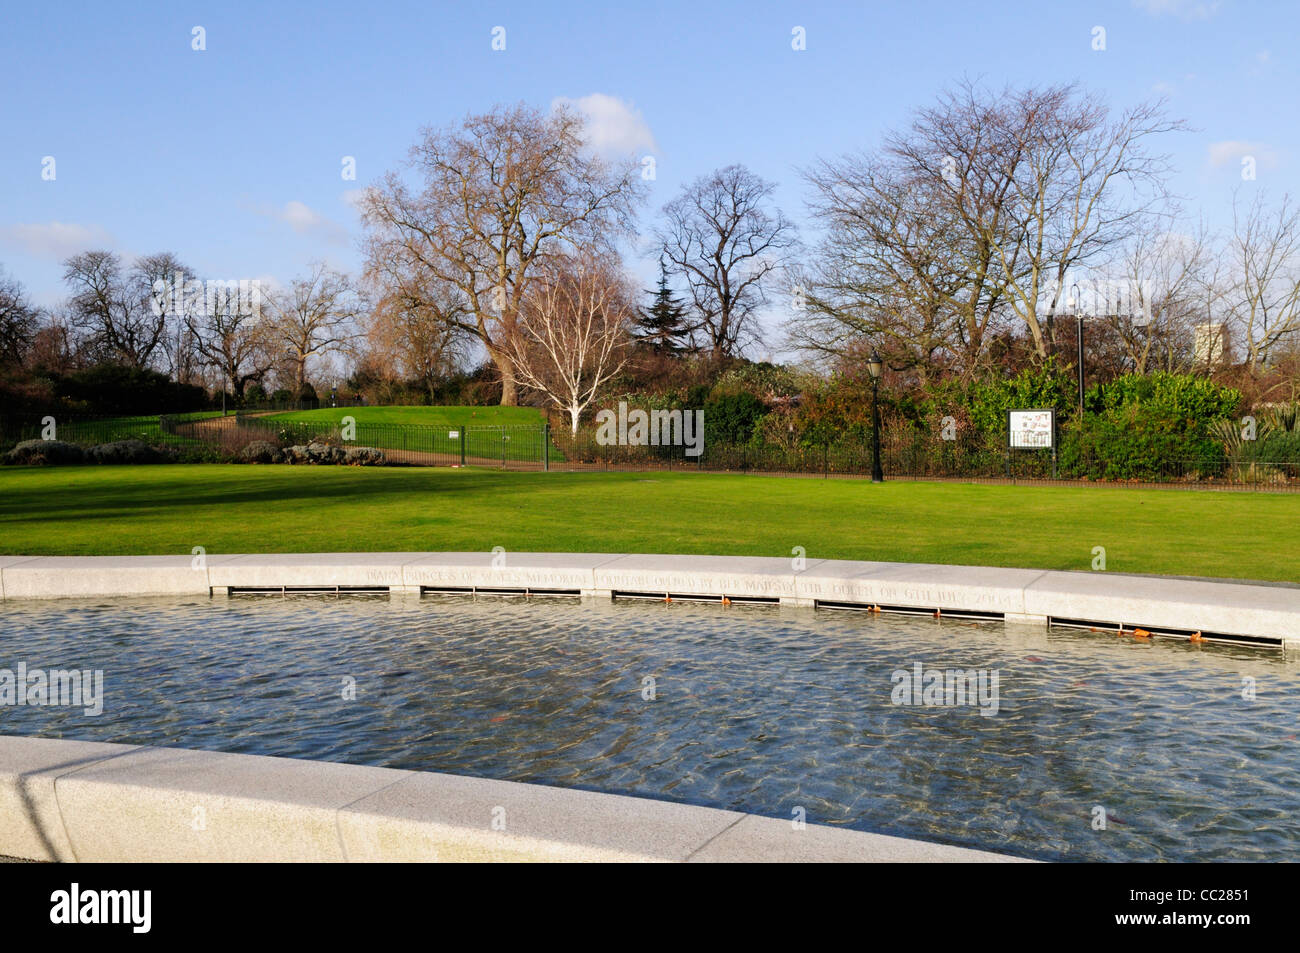 Princess Diana Memorial Fountain, Hyde Park, London, England - Stock Image